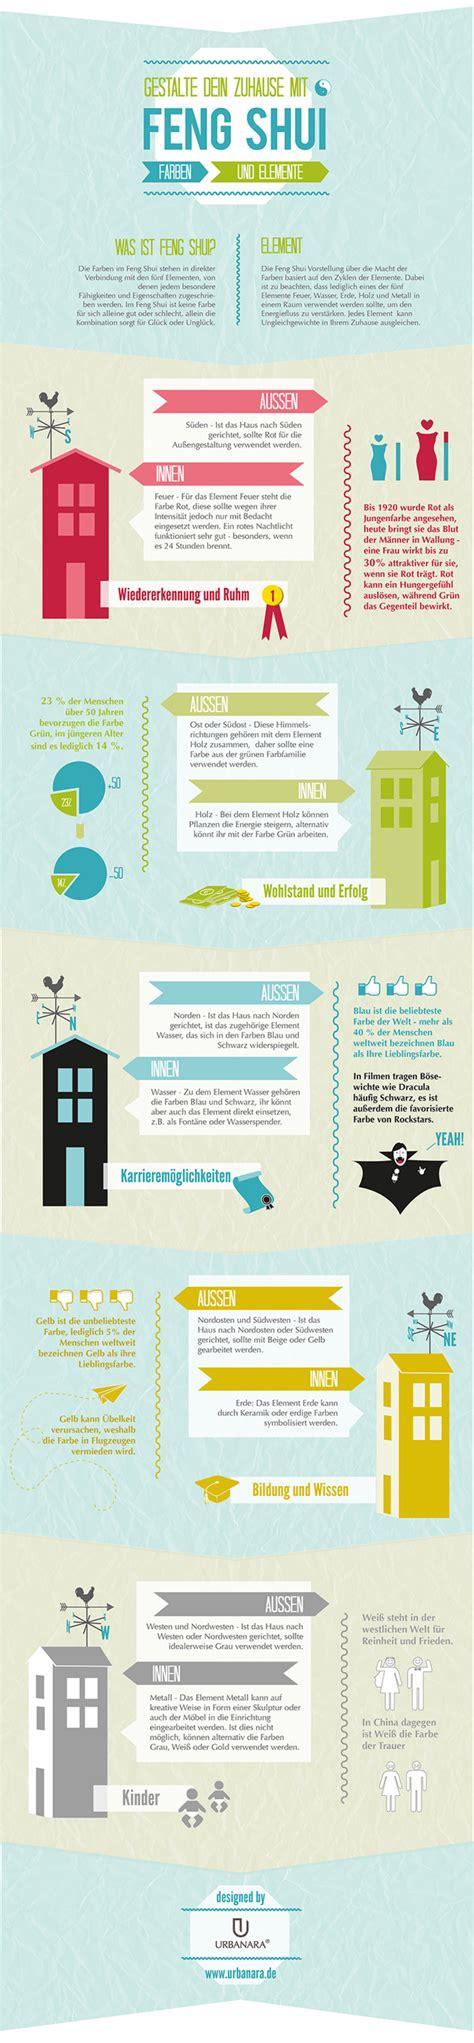 Feng Shui Büro Farben by Feng Shui Farben Die Infografik